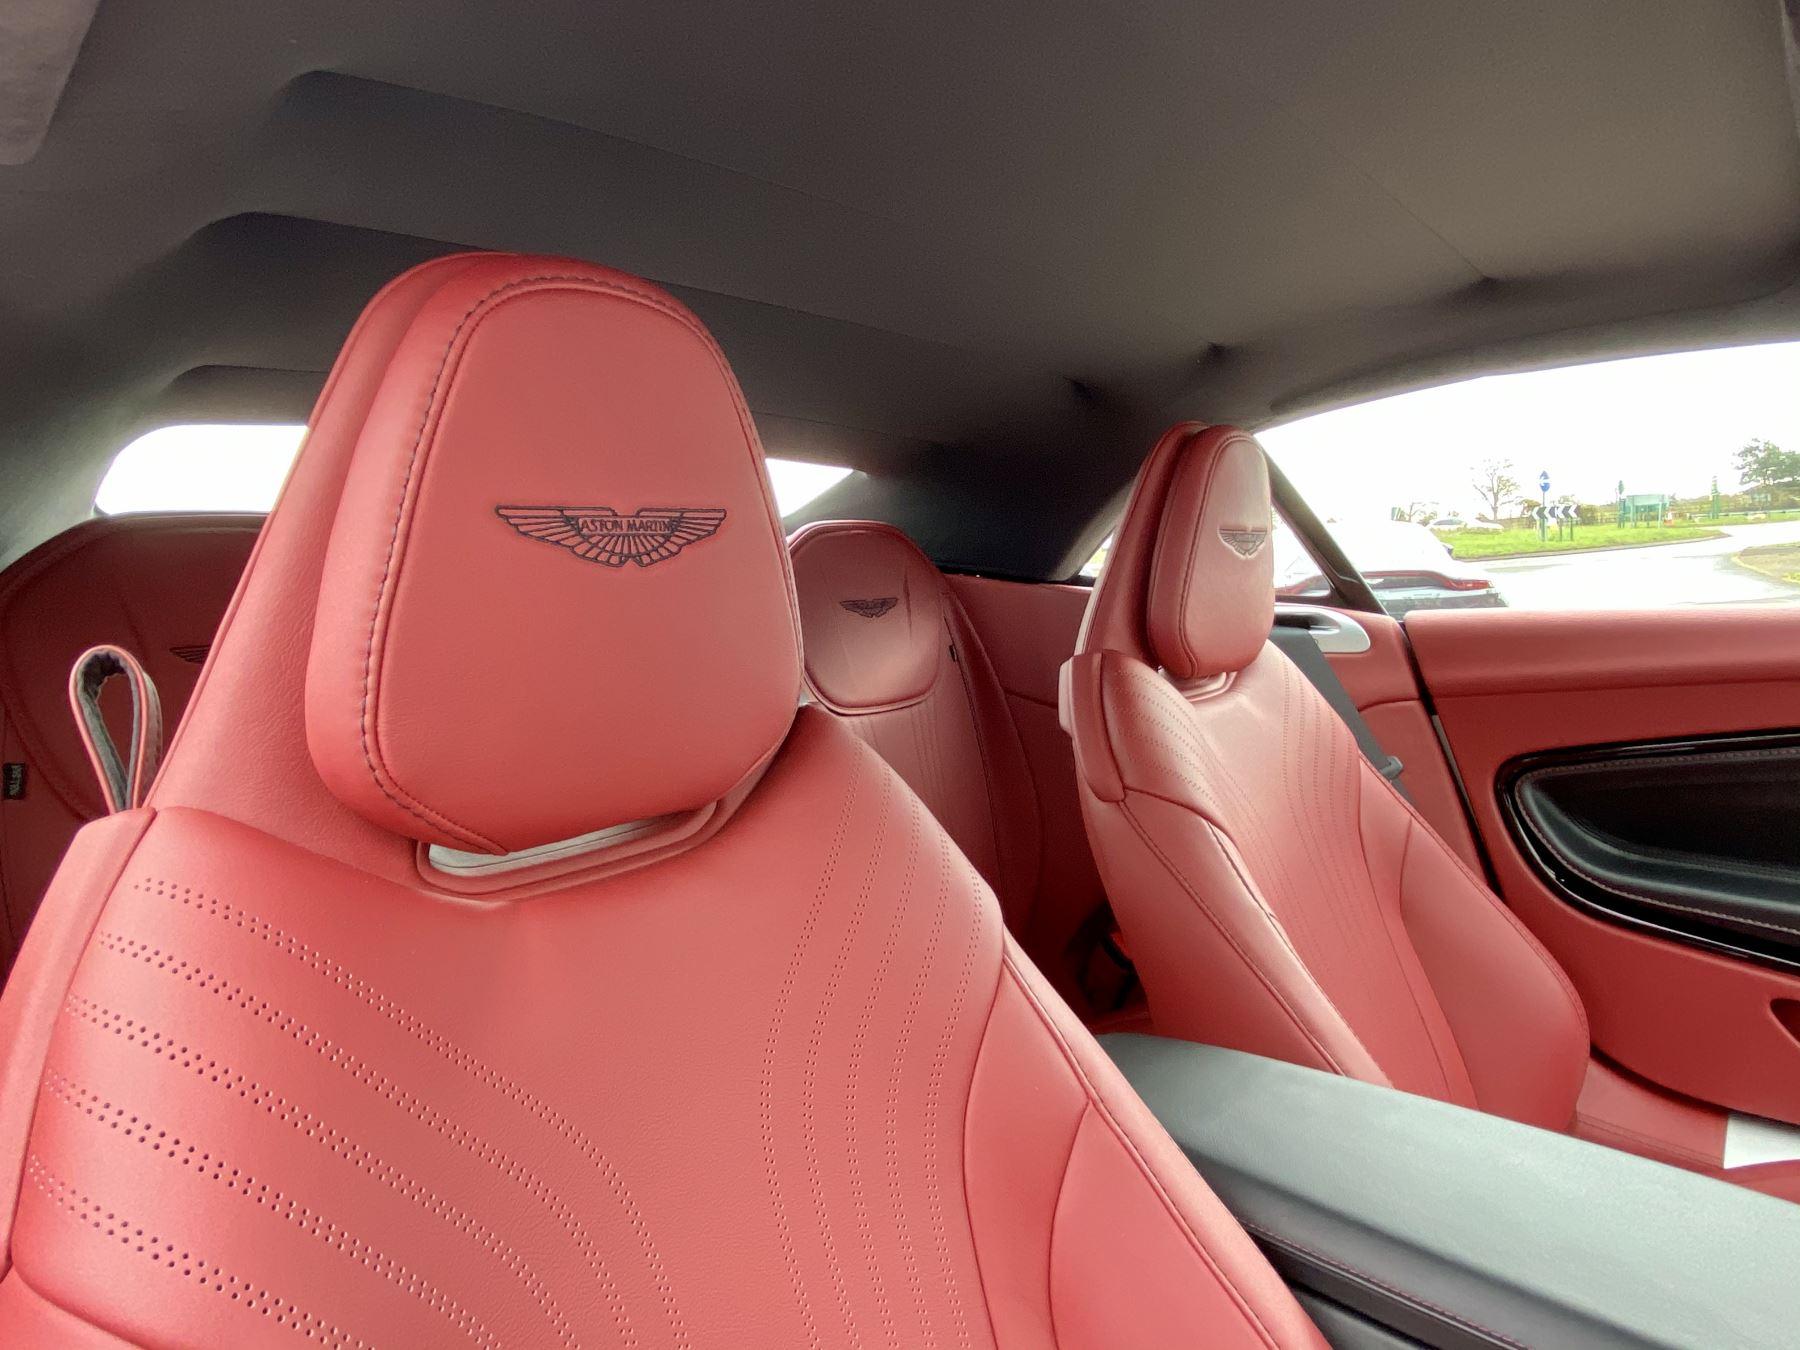 Aston Martin DB11 V8 Volante 2dr Touchtronic image 10